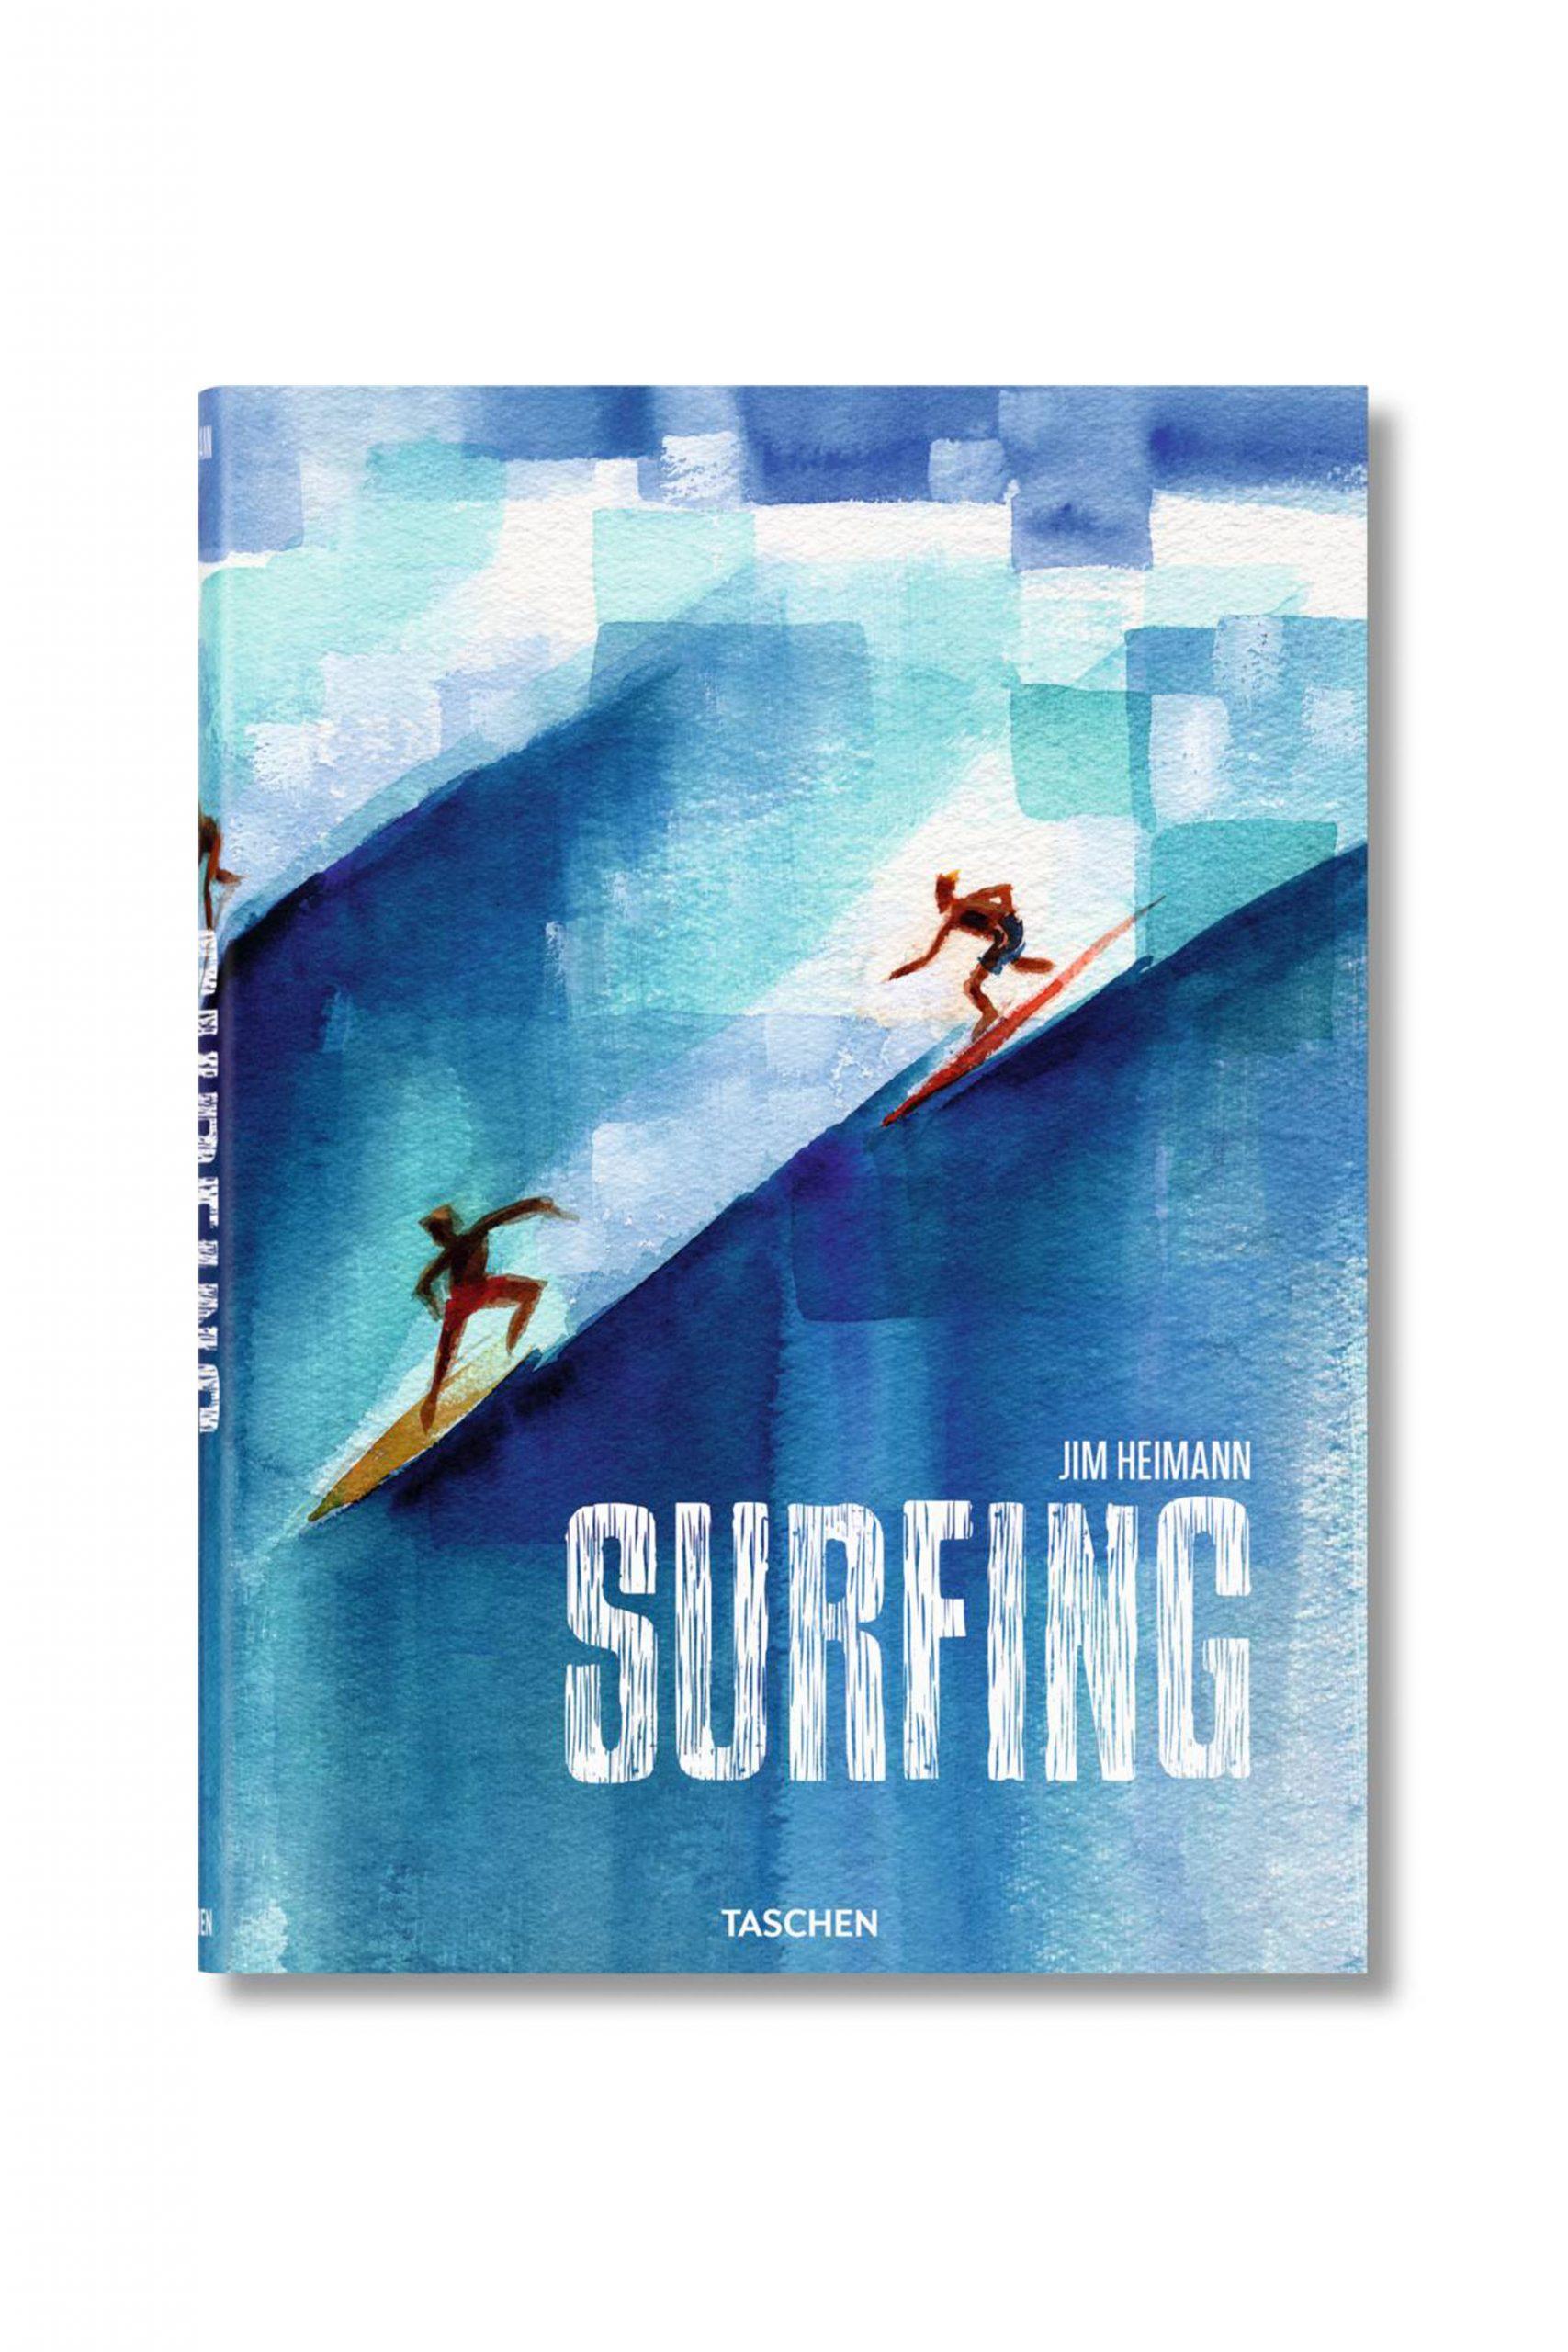 <p class='small-title'>TASCHEN</p>SURFING